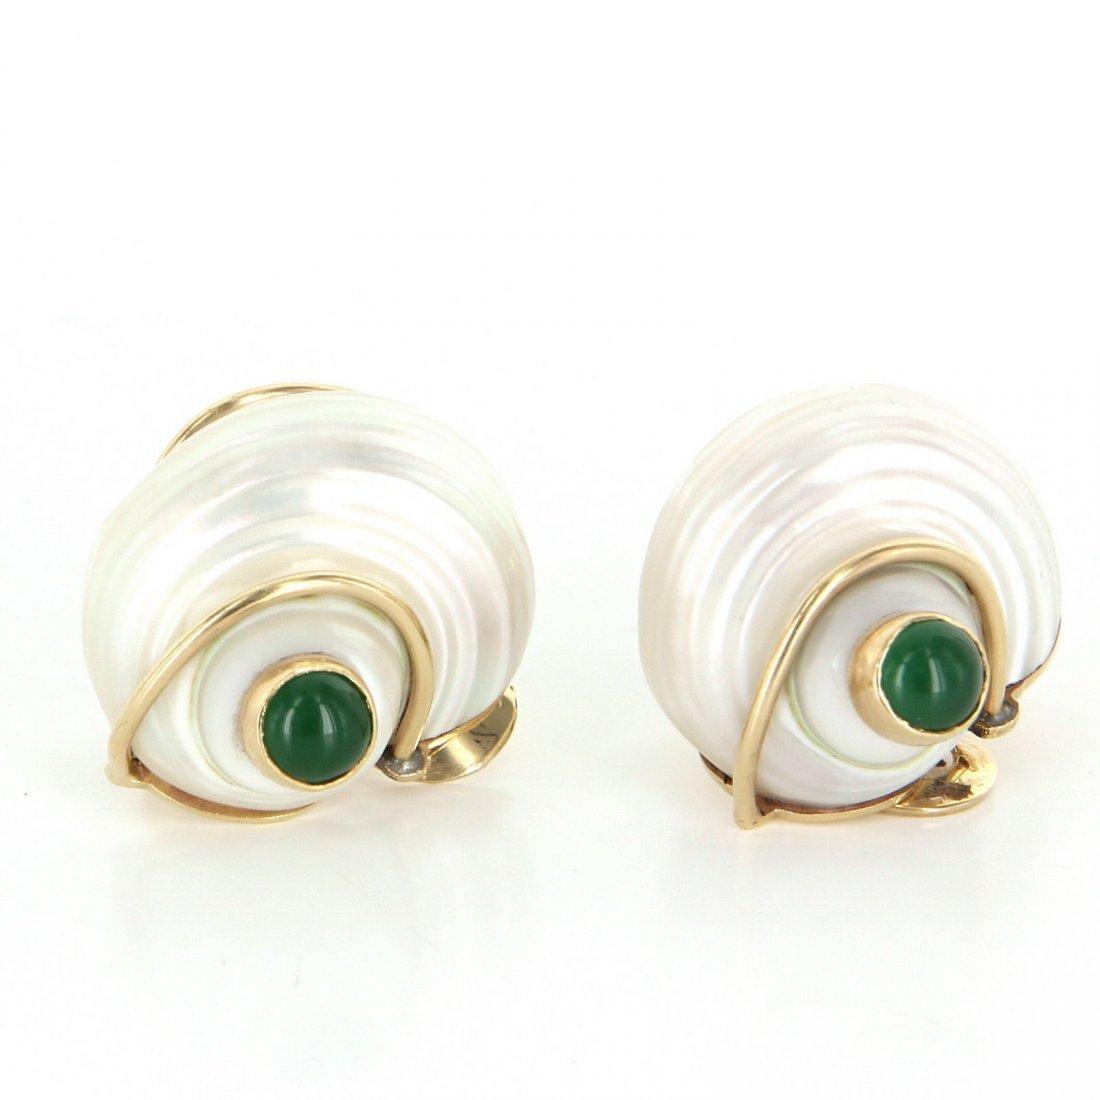 Seaman Schepps Turbo Collection Sea Shell Earrings 14k